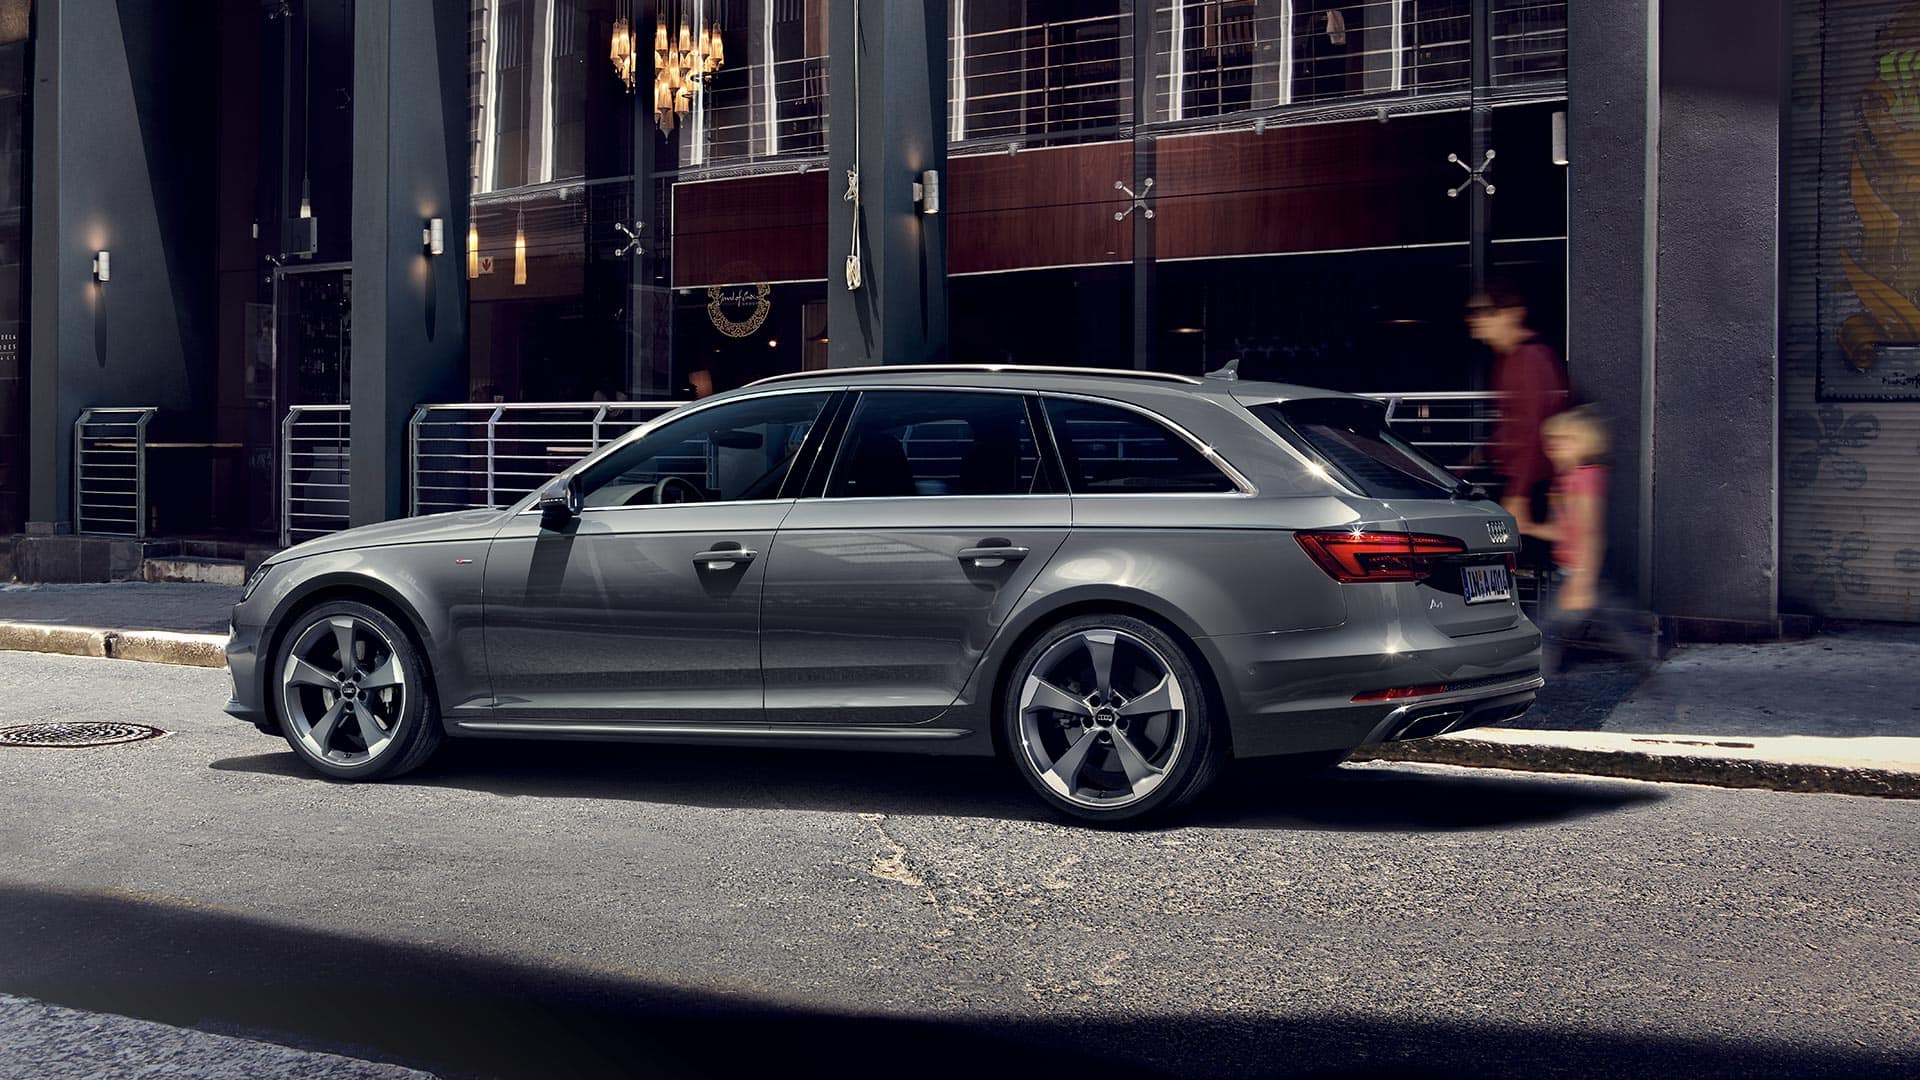 A4 Avant A4 Audi Polska Przewaga Dzięki Technice